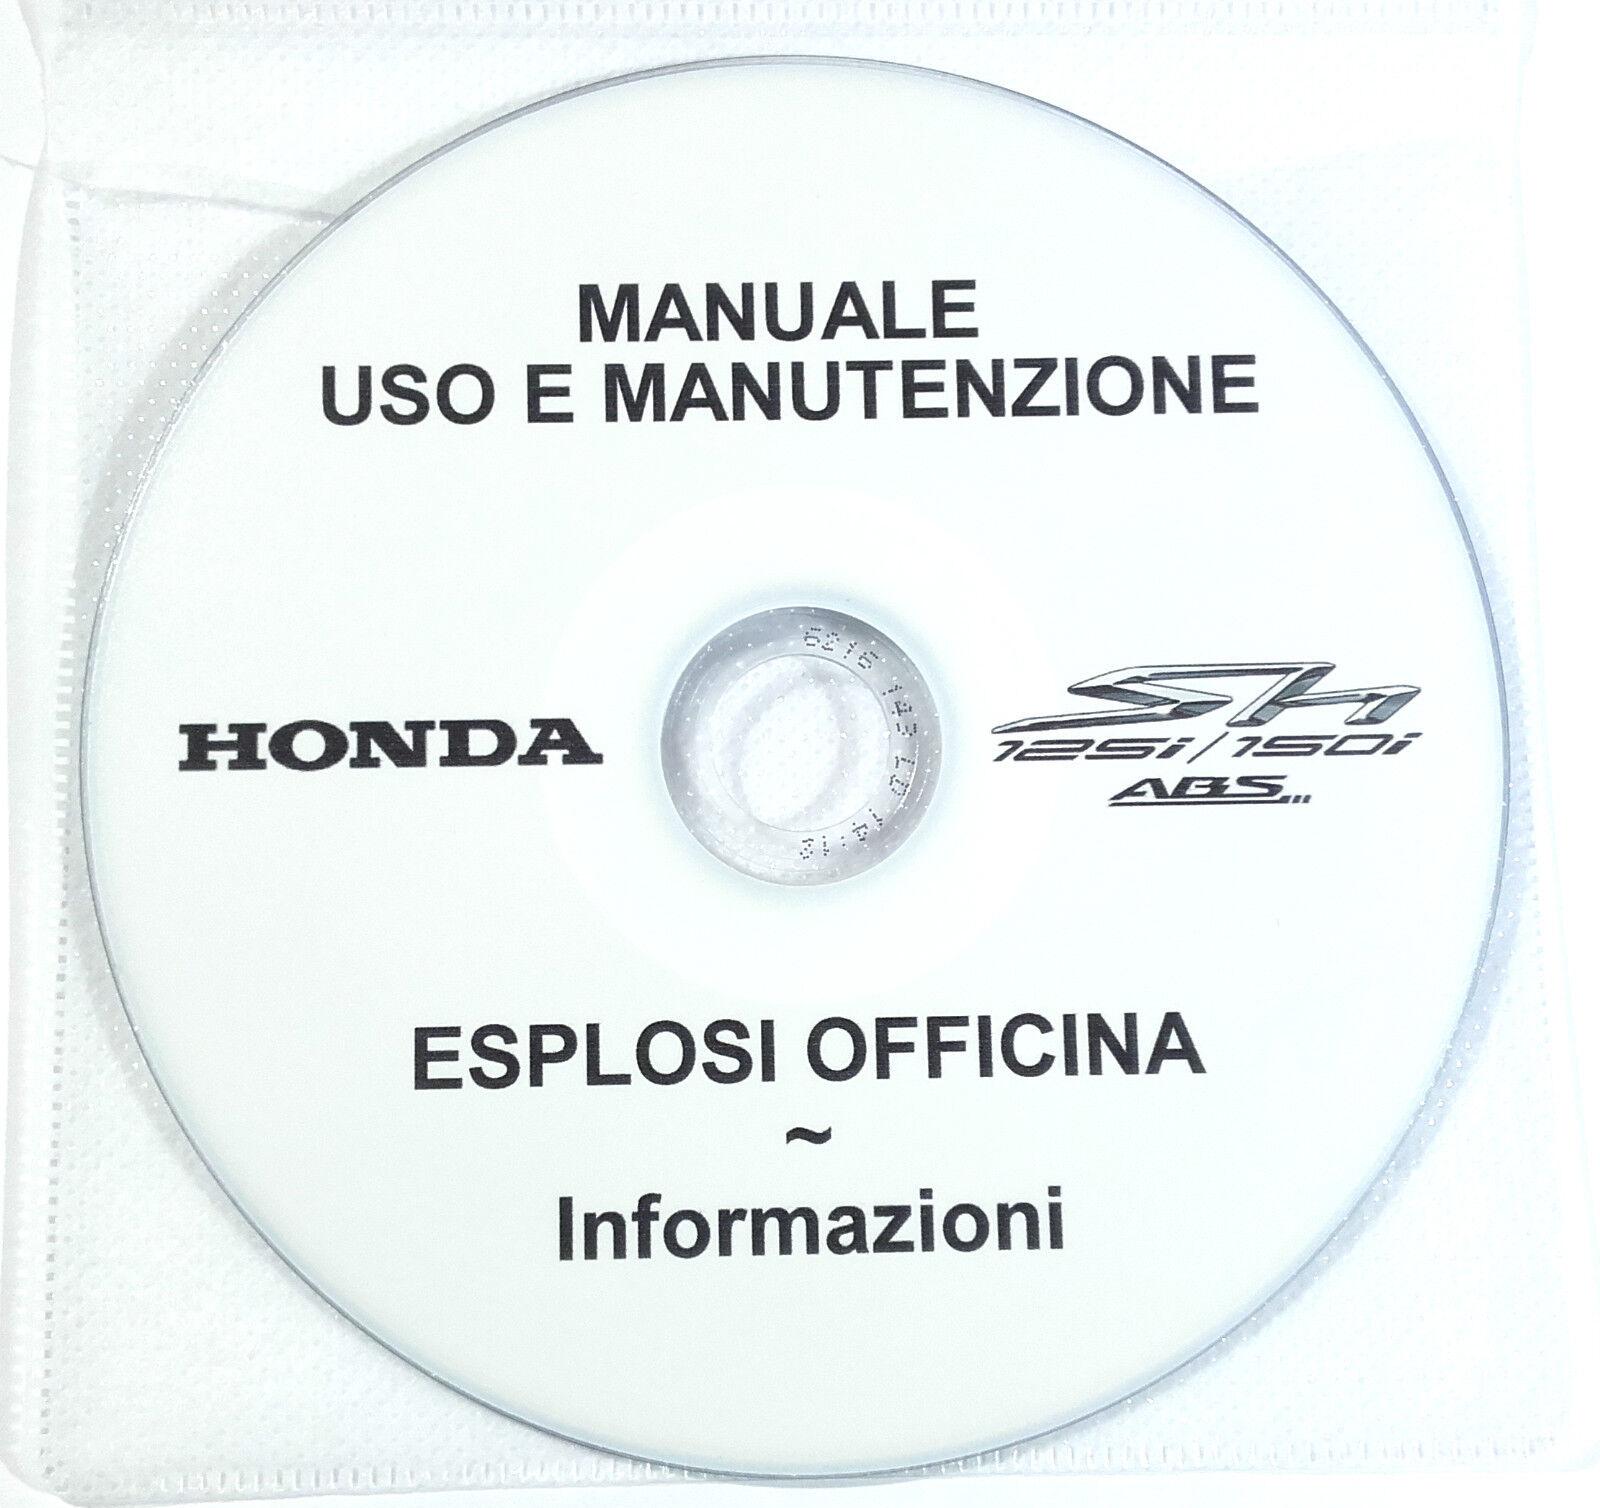 1 di 2 Cd Manuale Uso Manutenzione+Esplosi Officina Honda Sh 125-150 Abs  2012-2013